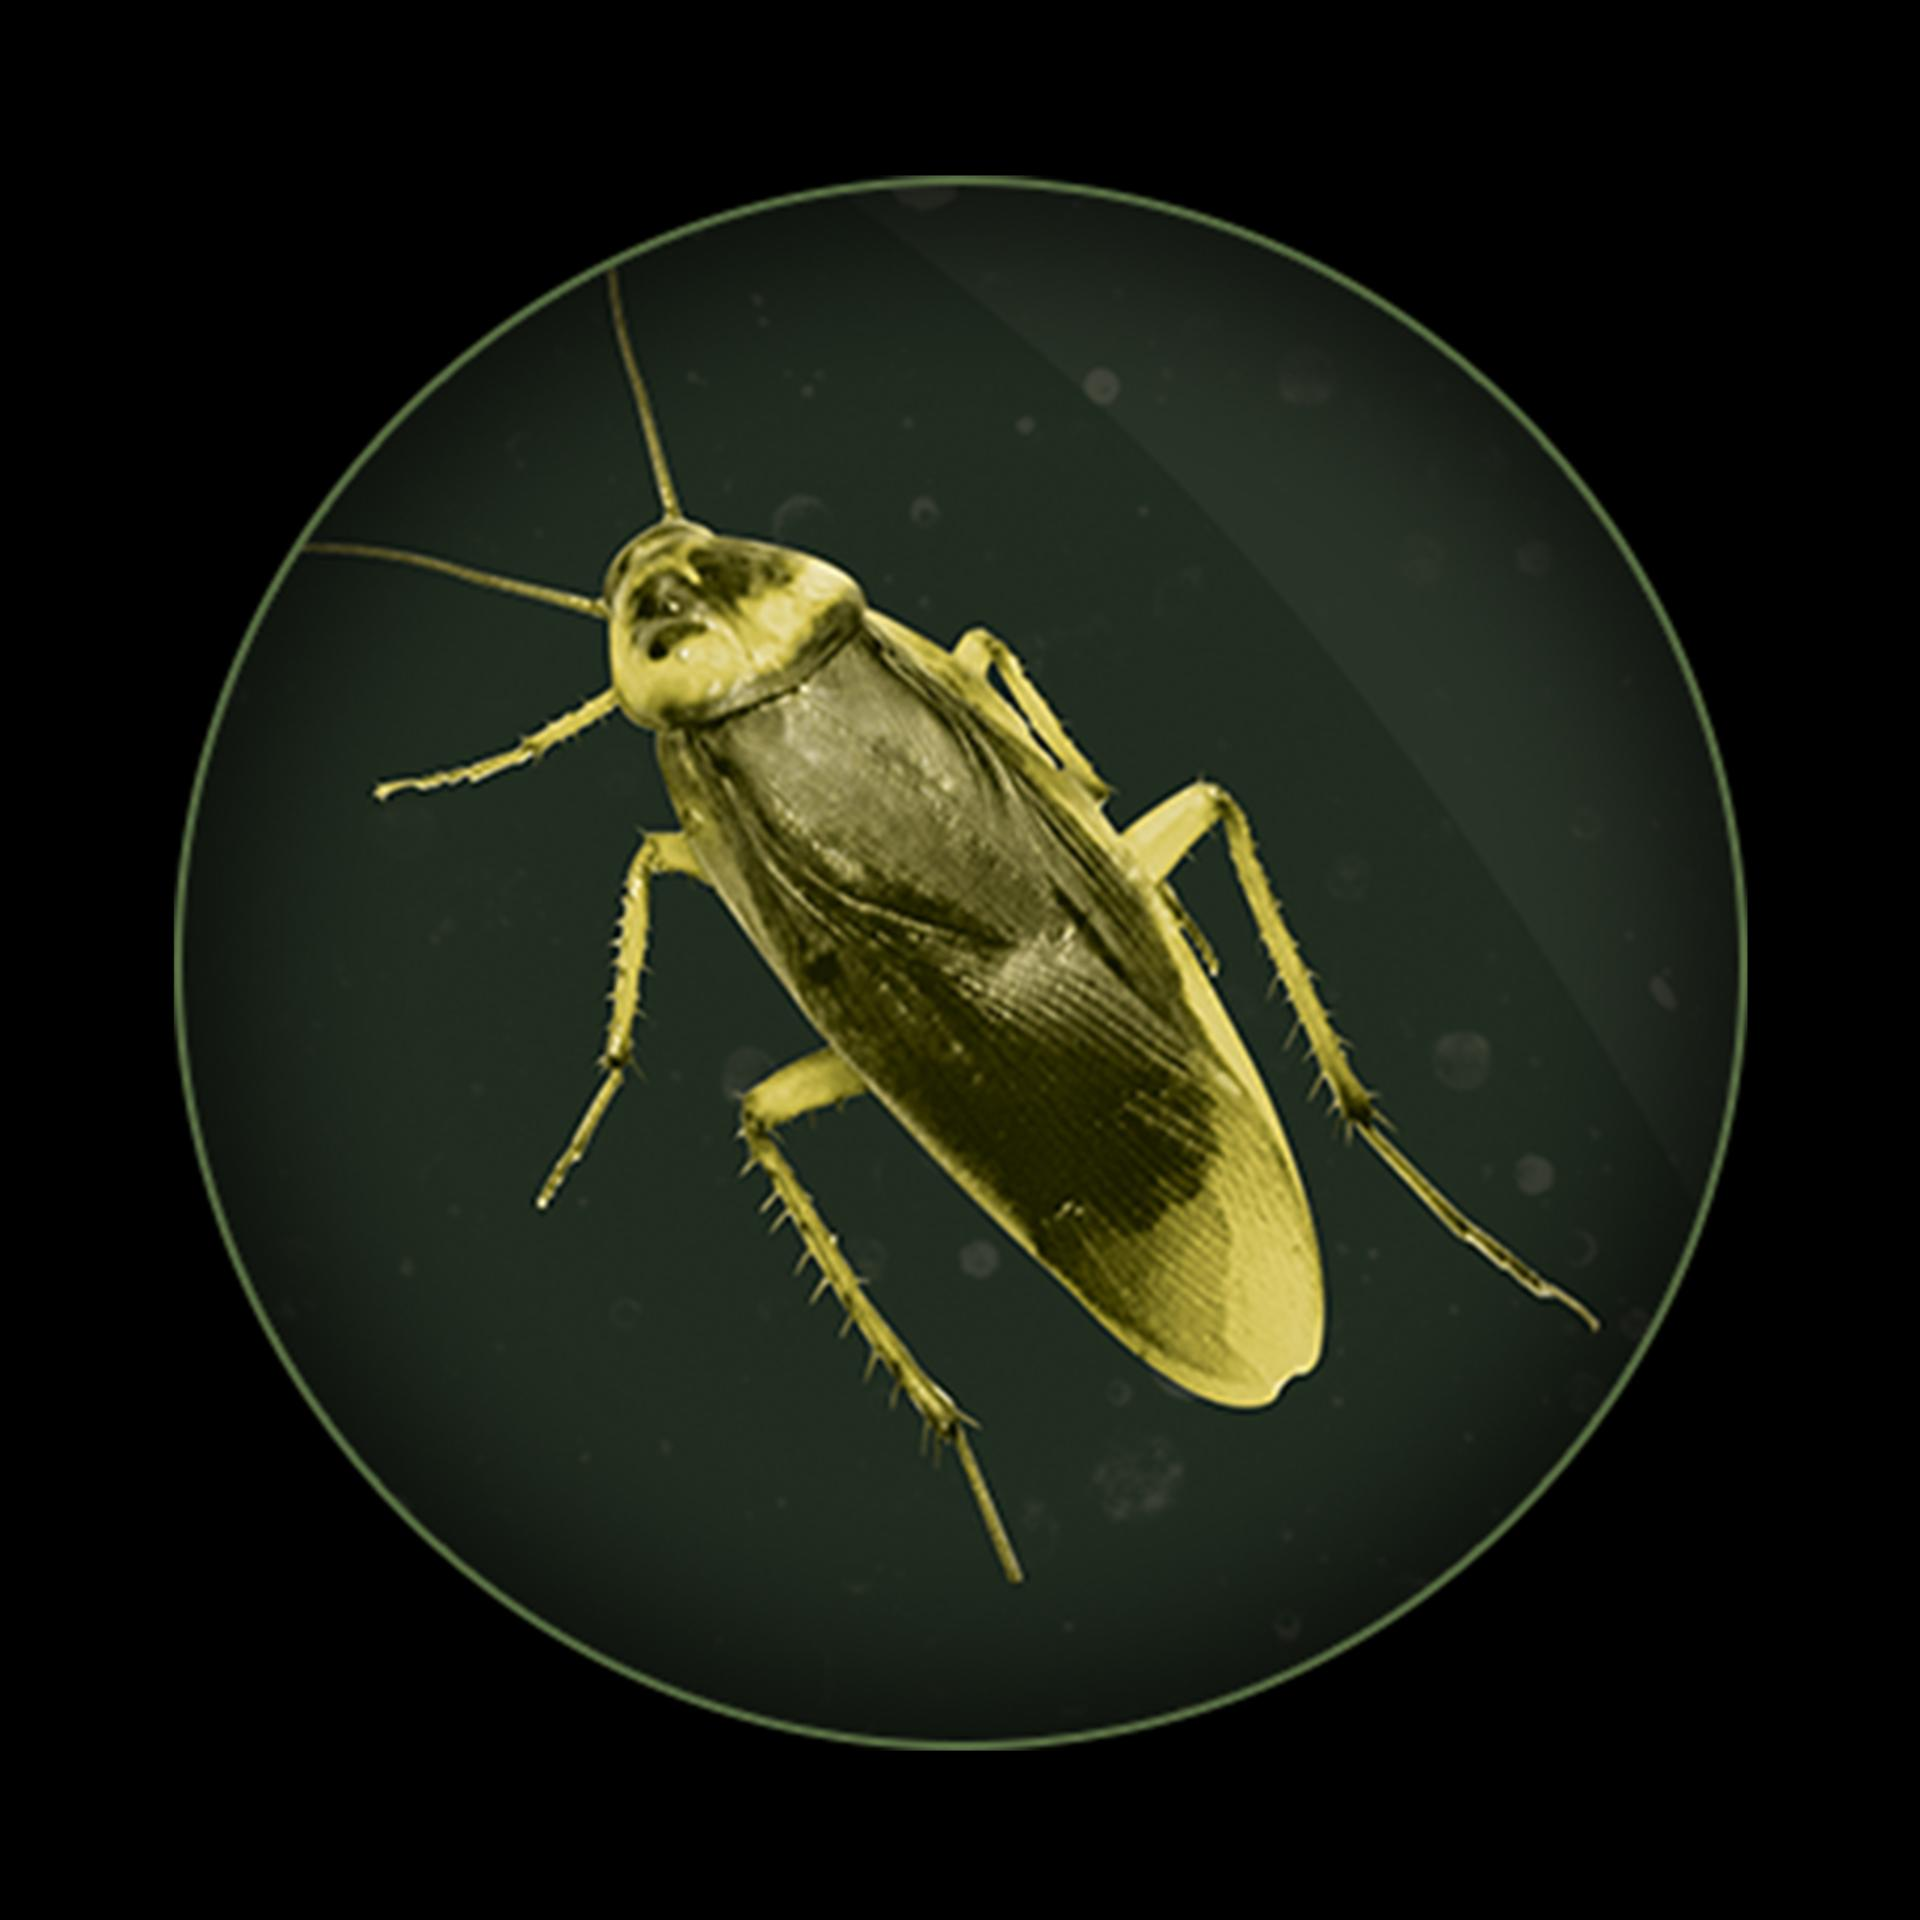 Cockroach under UV lighting